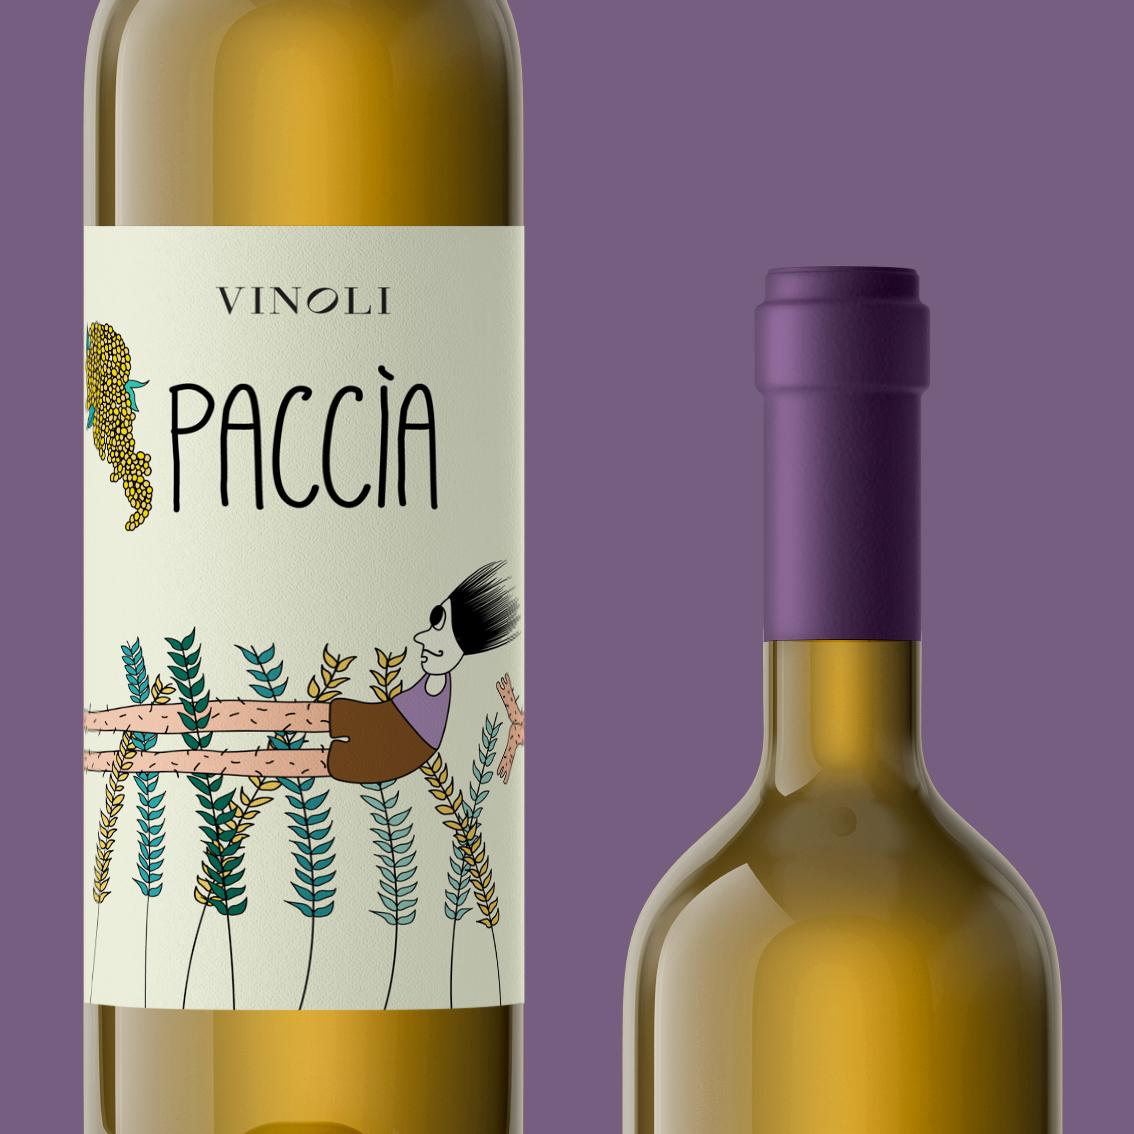 https://www.orlandinifrancesco.com/wp/wp-content/uploads/2019/07/2-Paccia-Bottiglia.jpg